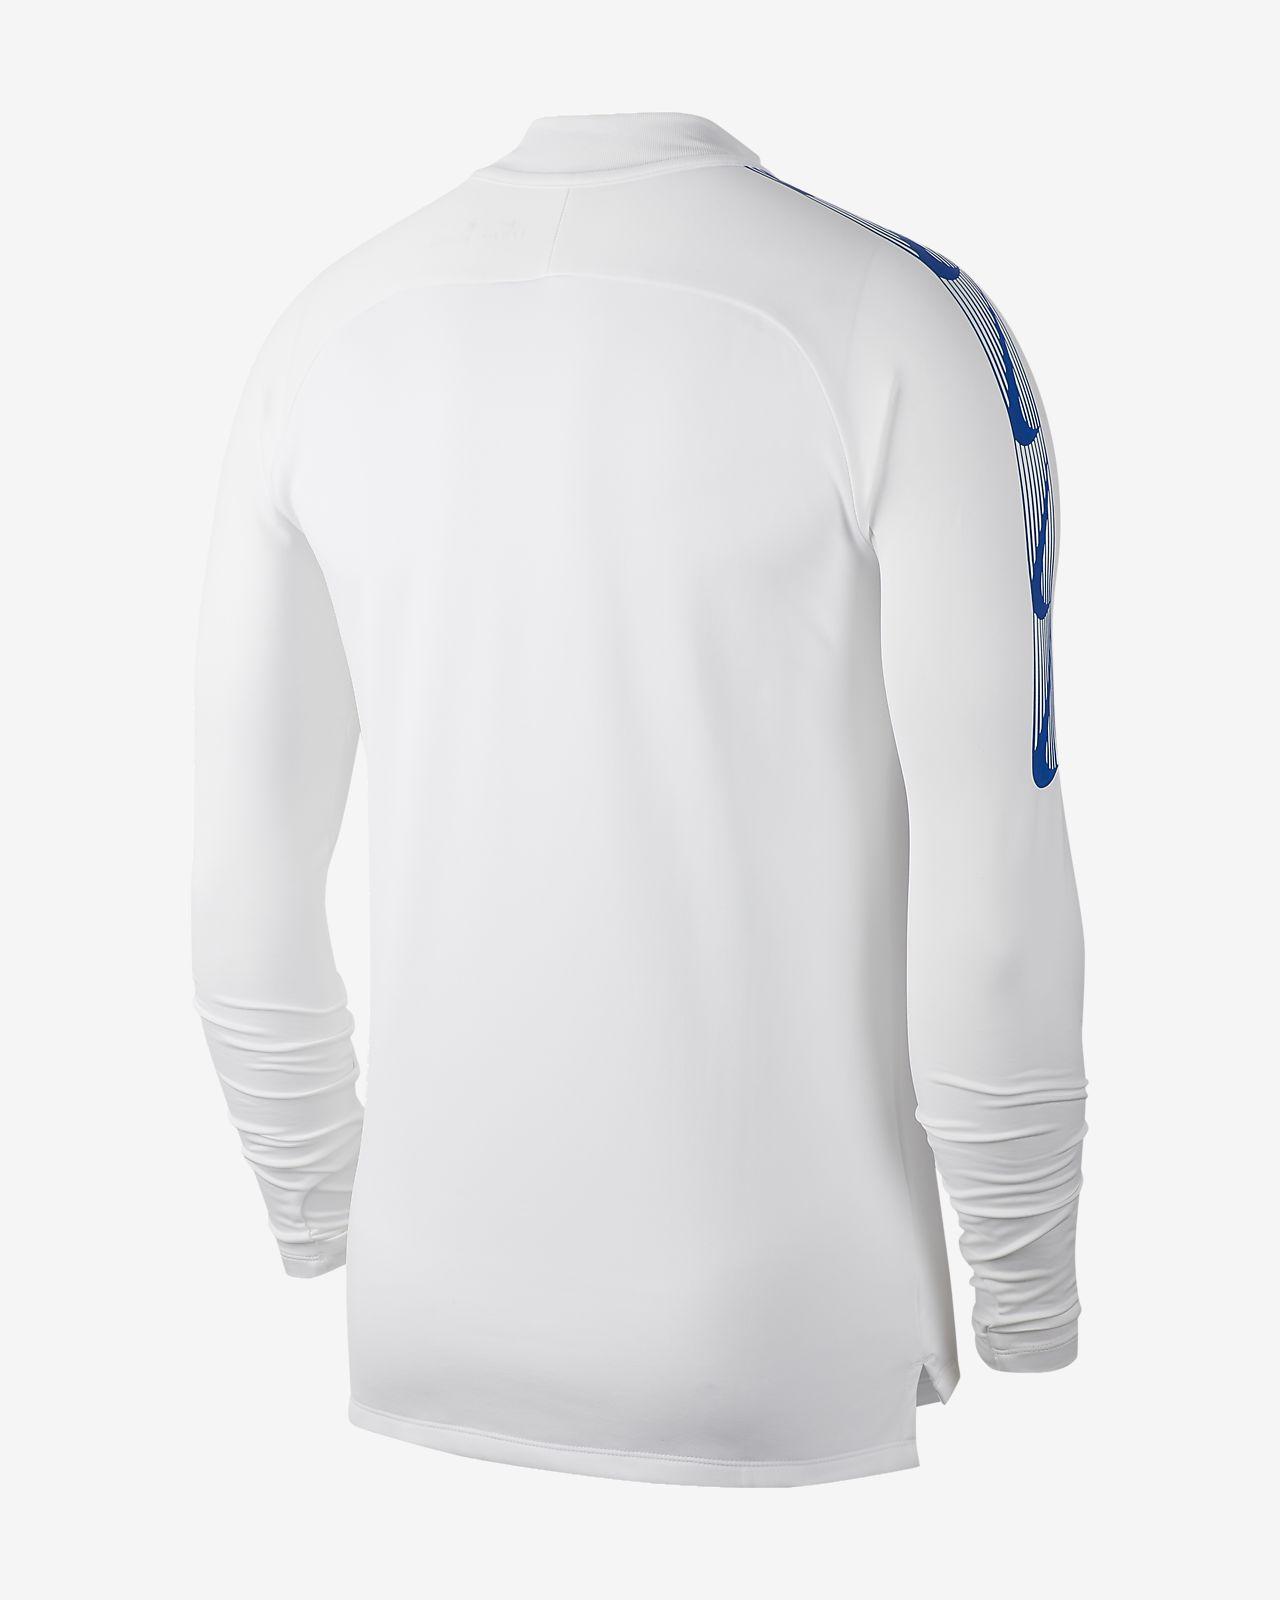 259f9c6fe92855 Chelsea FC Dri-FIT Squad Drill Men's Long-Sleeve Football Top. Nike ...